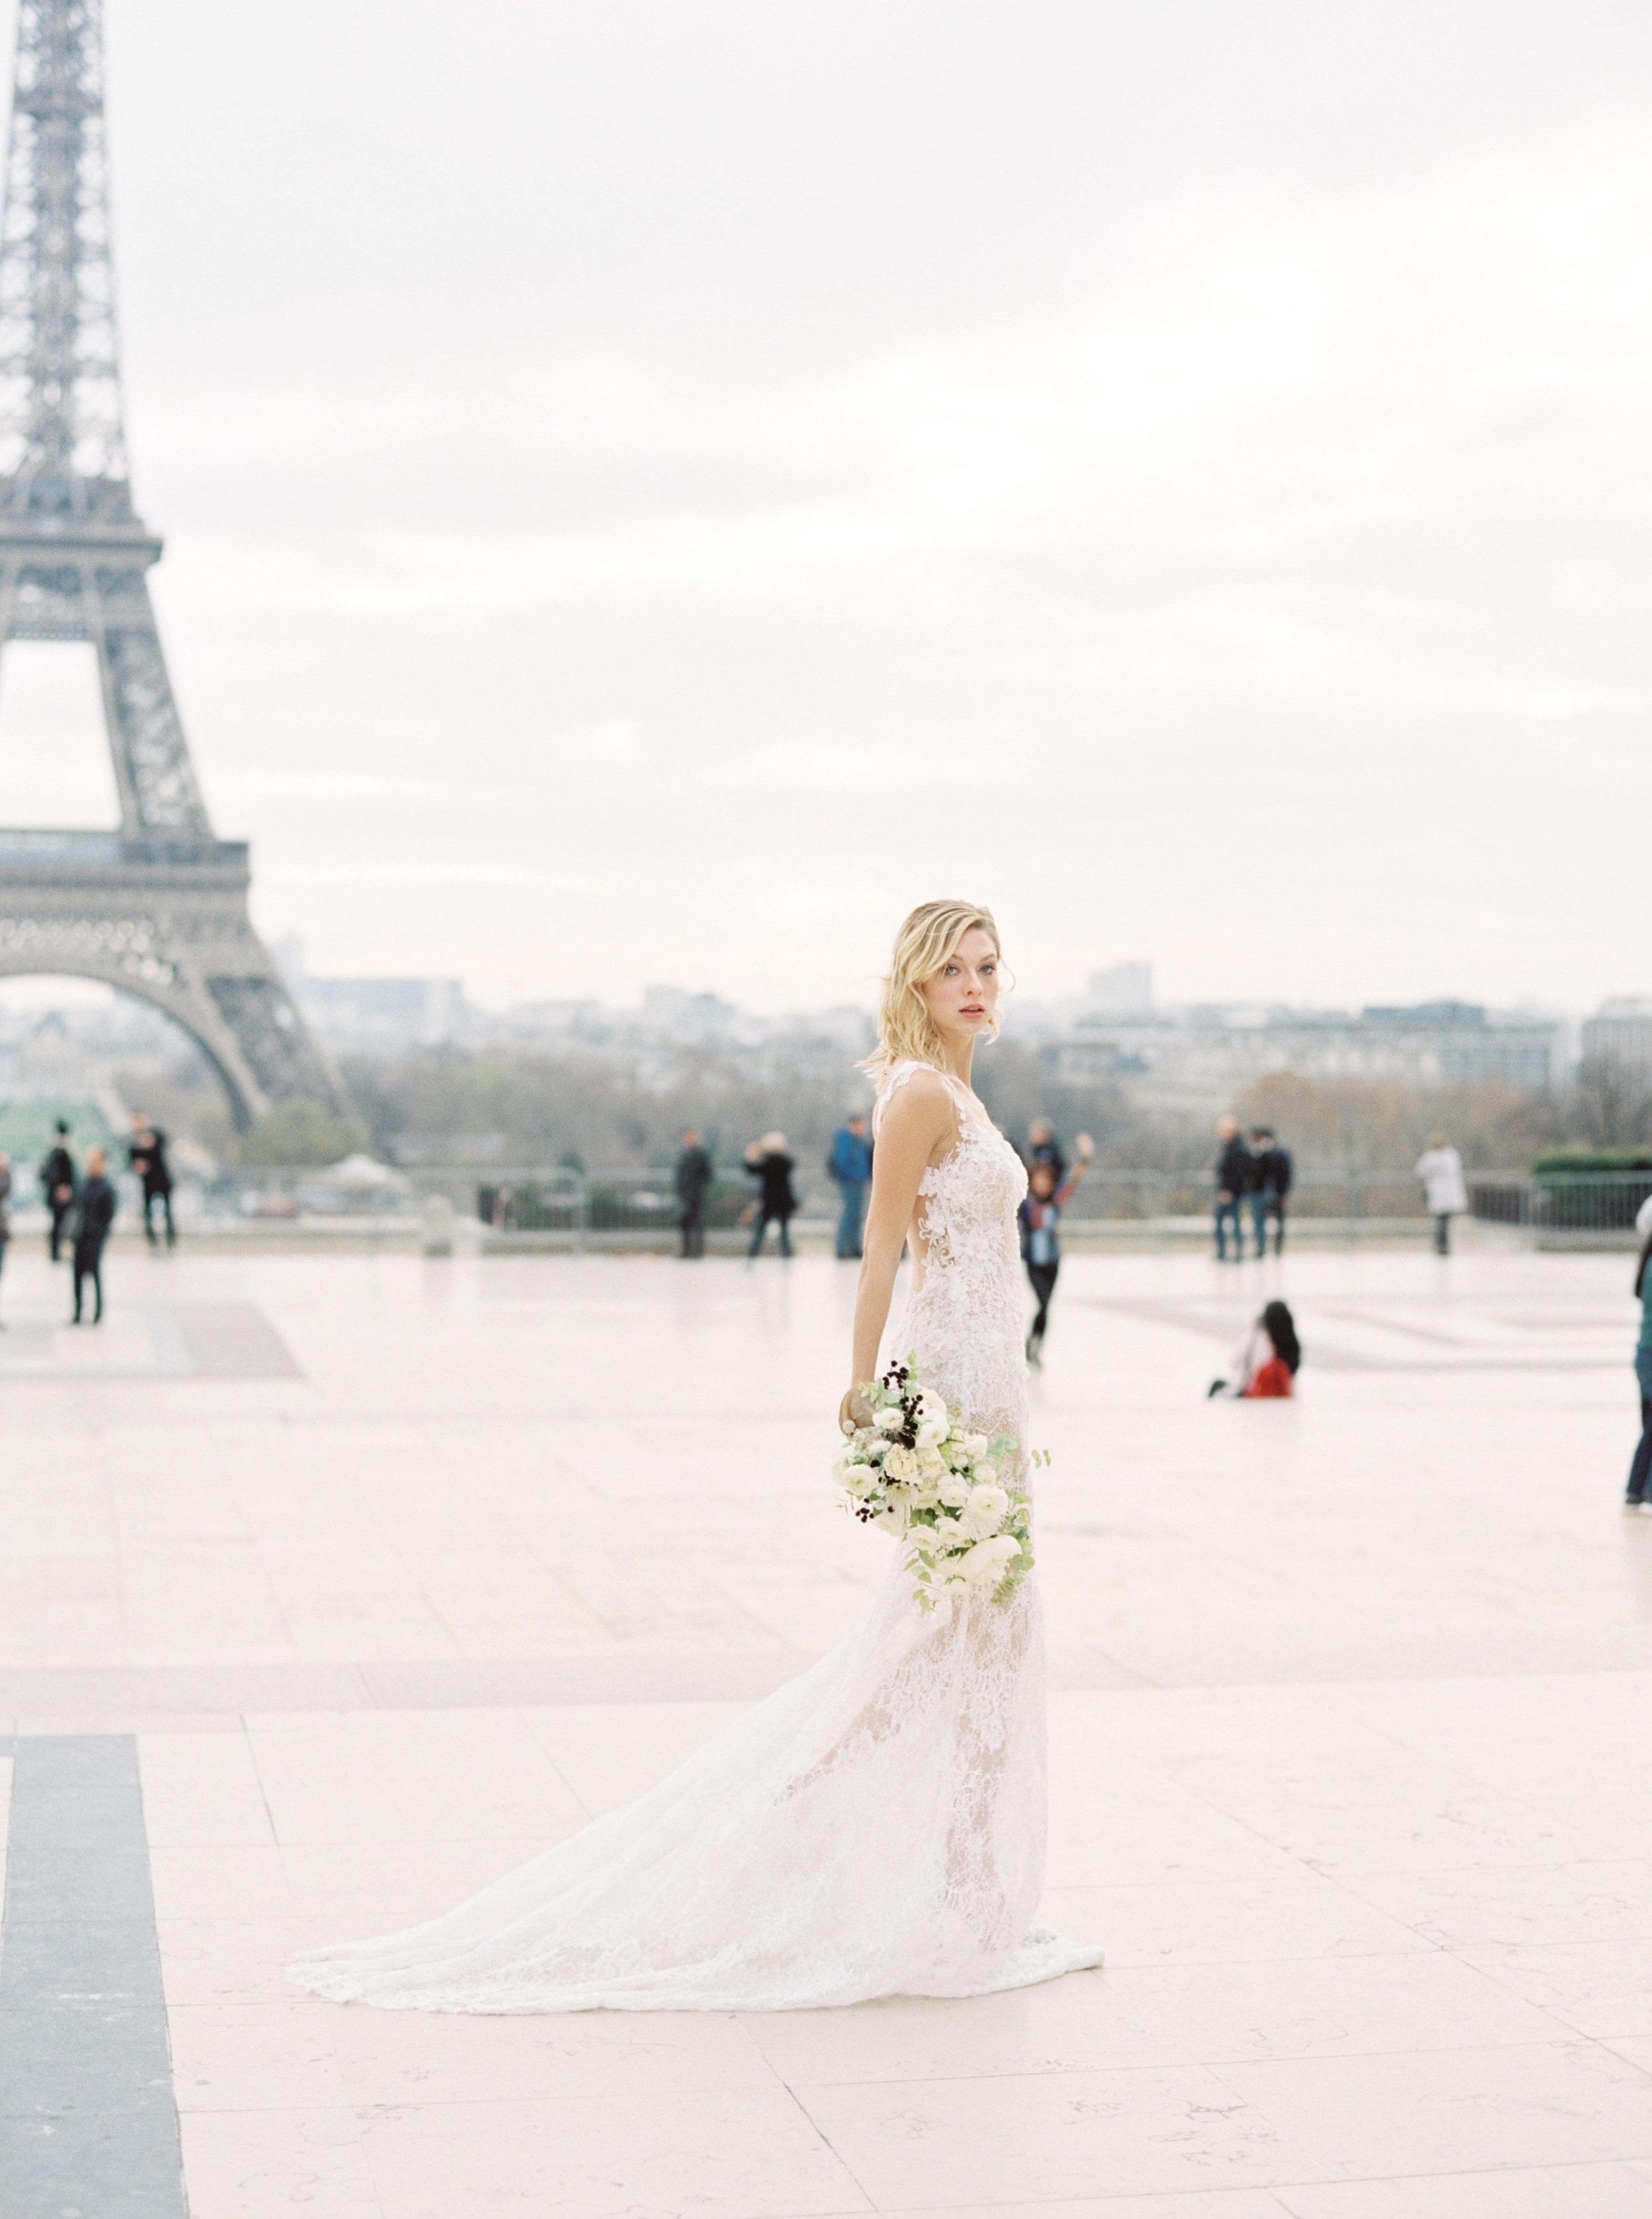 JennyQuicksallPhotography_ParisFrance_-21.jpg